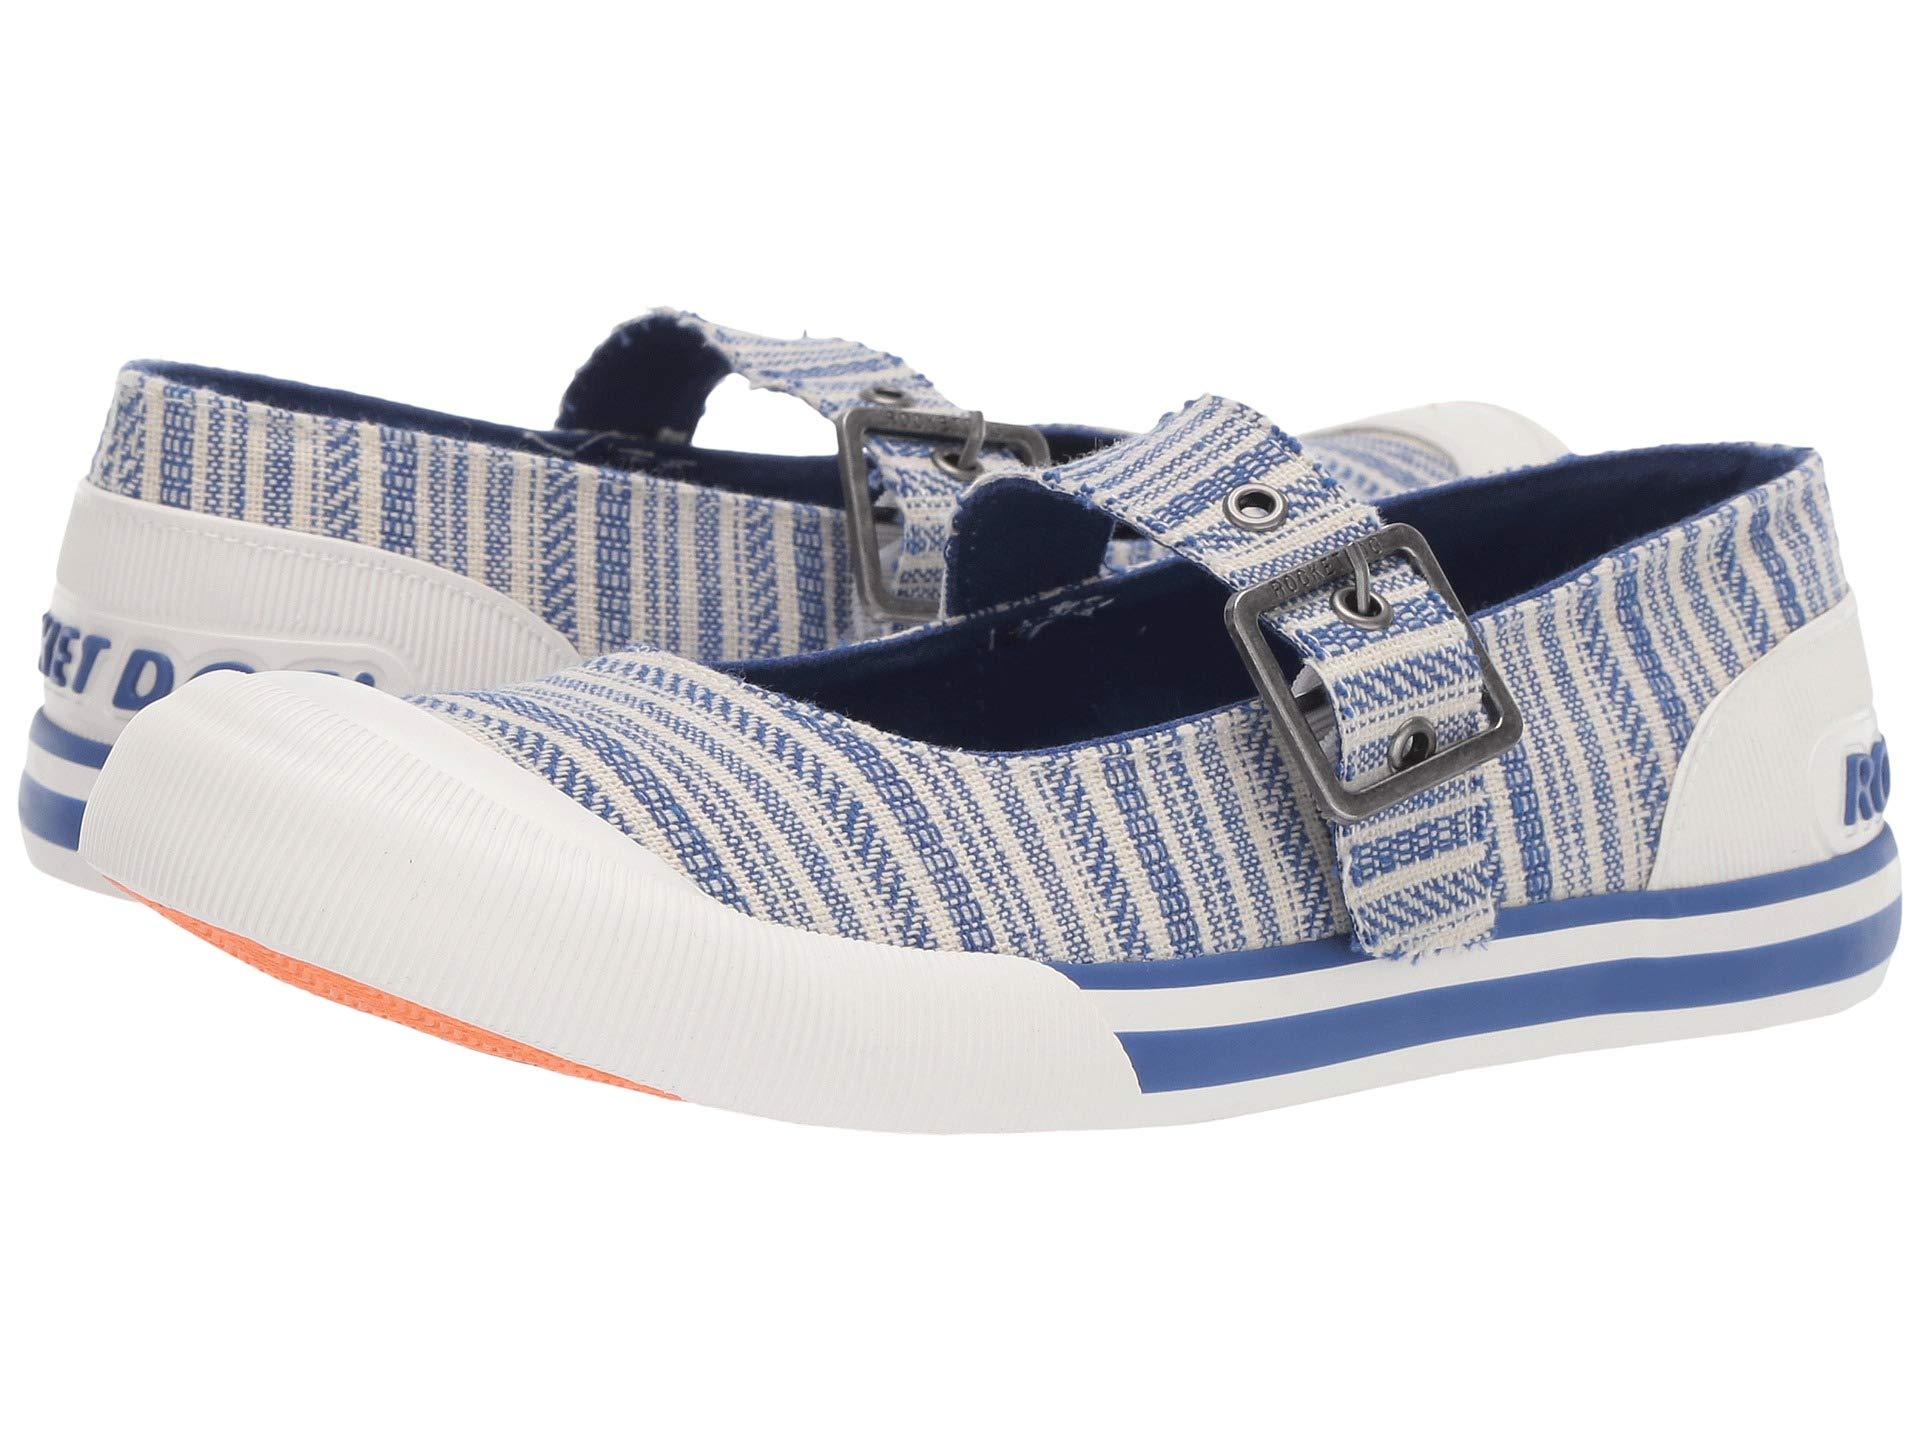 da4cc268b1ecc Sneakers Cascade Dog Jazzin amp; Jane Shoes Athletic Blue Rocket xZTqXOx